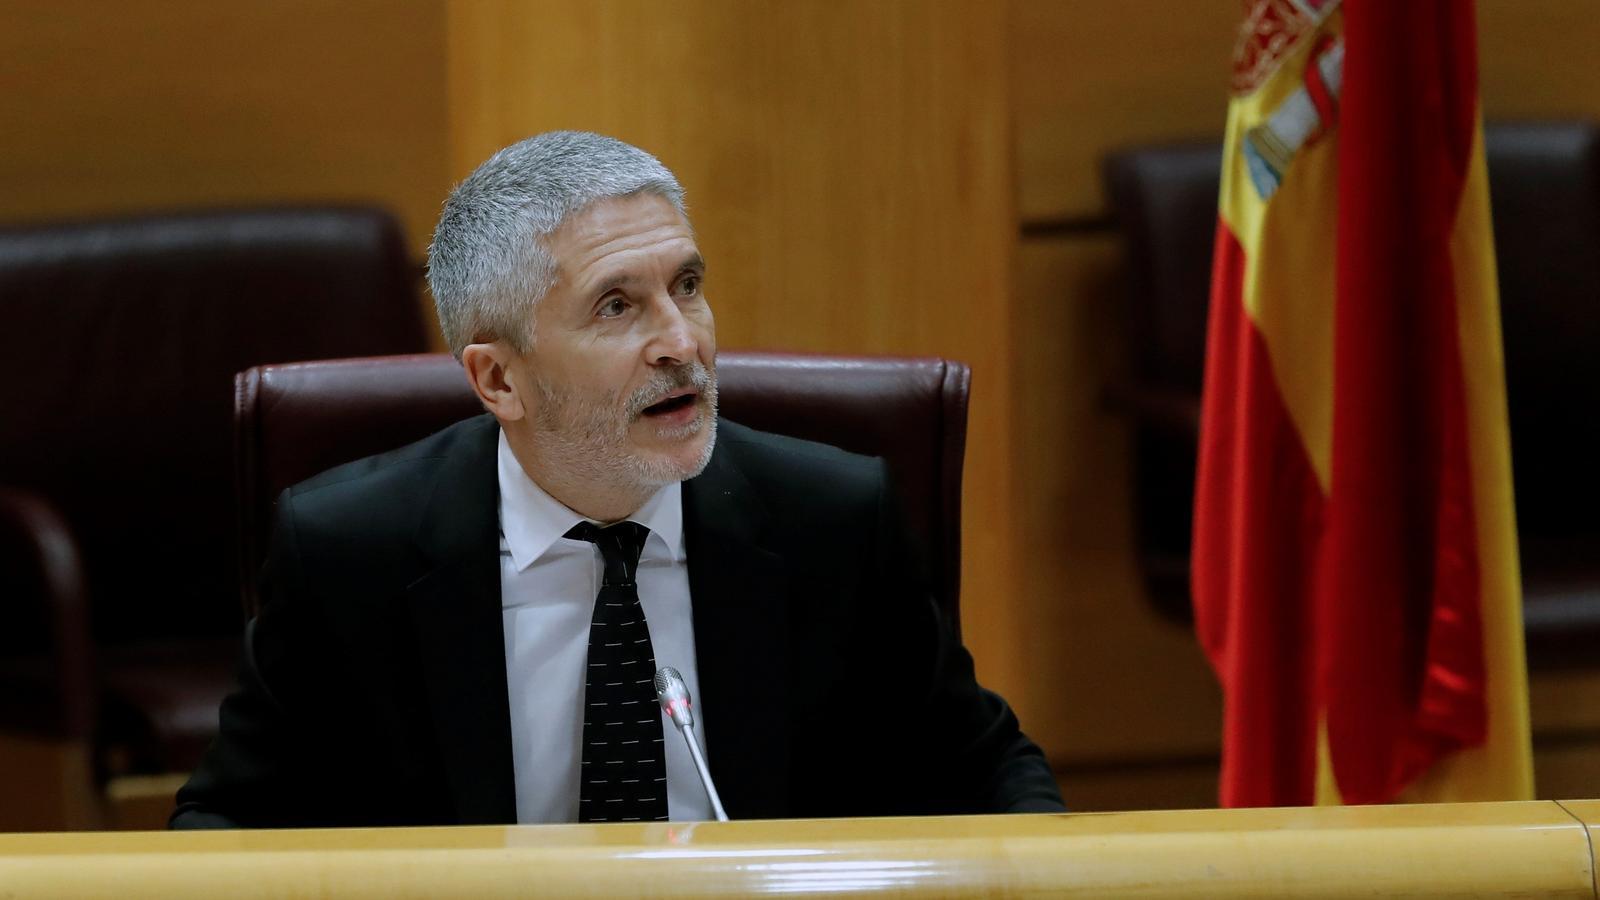 La fúria del ministre-jutge